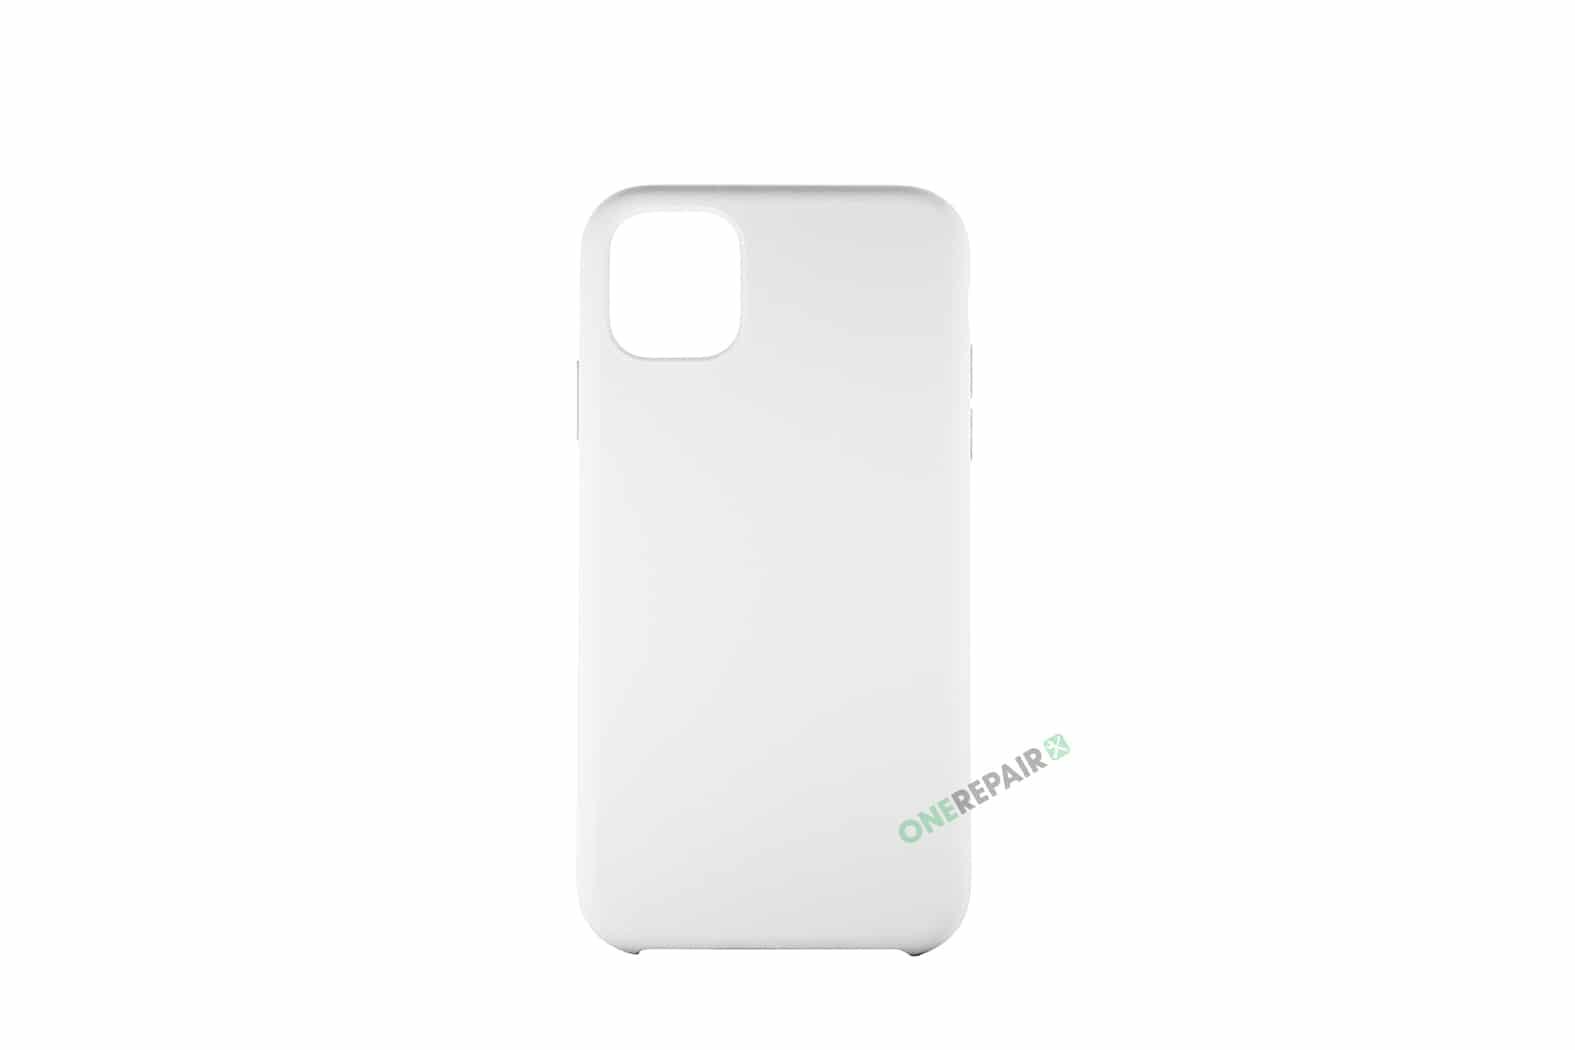 353776-002_iPhone_11_Silikone_cover_hvid_onerepair_00001